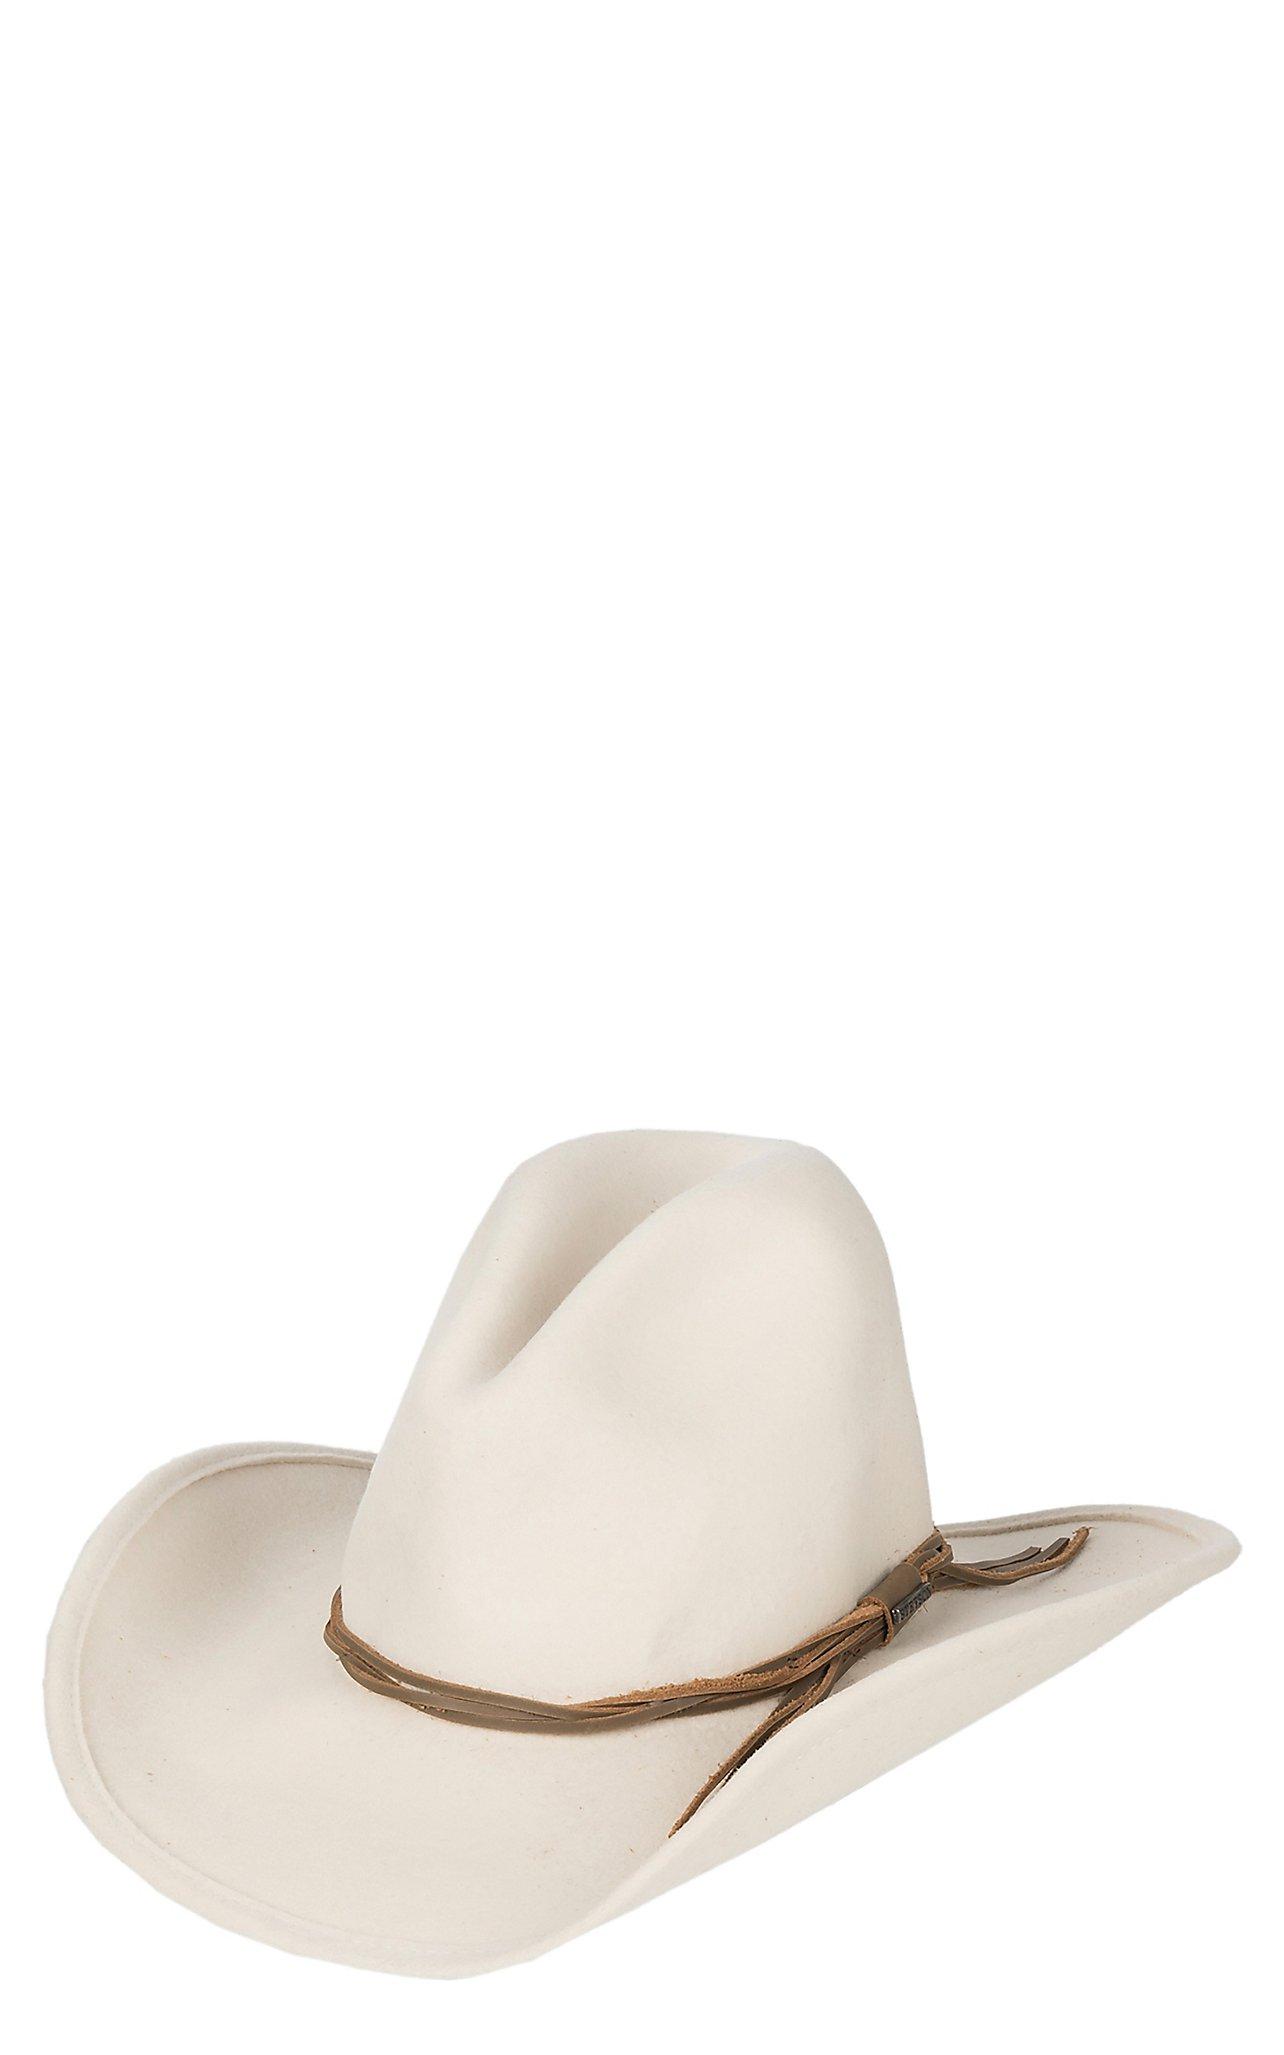 Stetson  Stetson Gus Crush Silverbelly Woven w  Leather Band Wool Cowboy Hat dc15f094da0